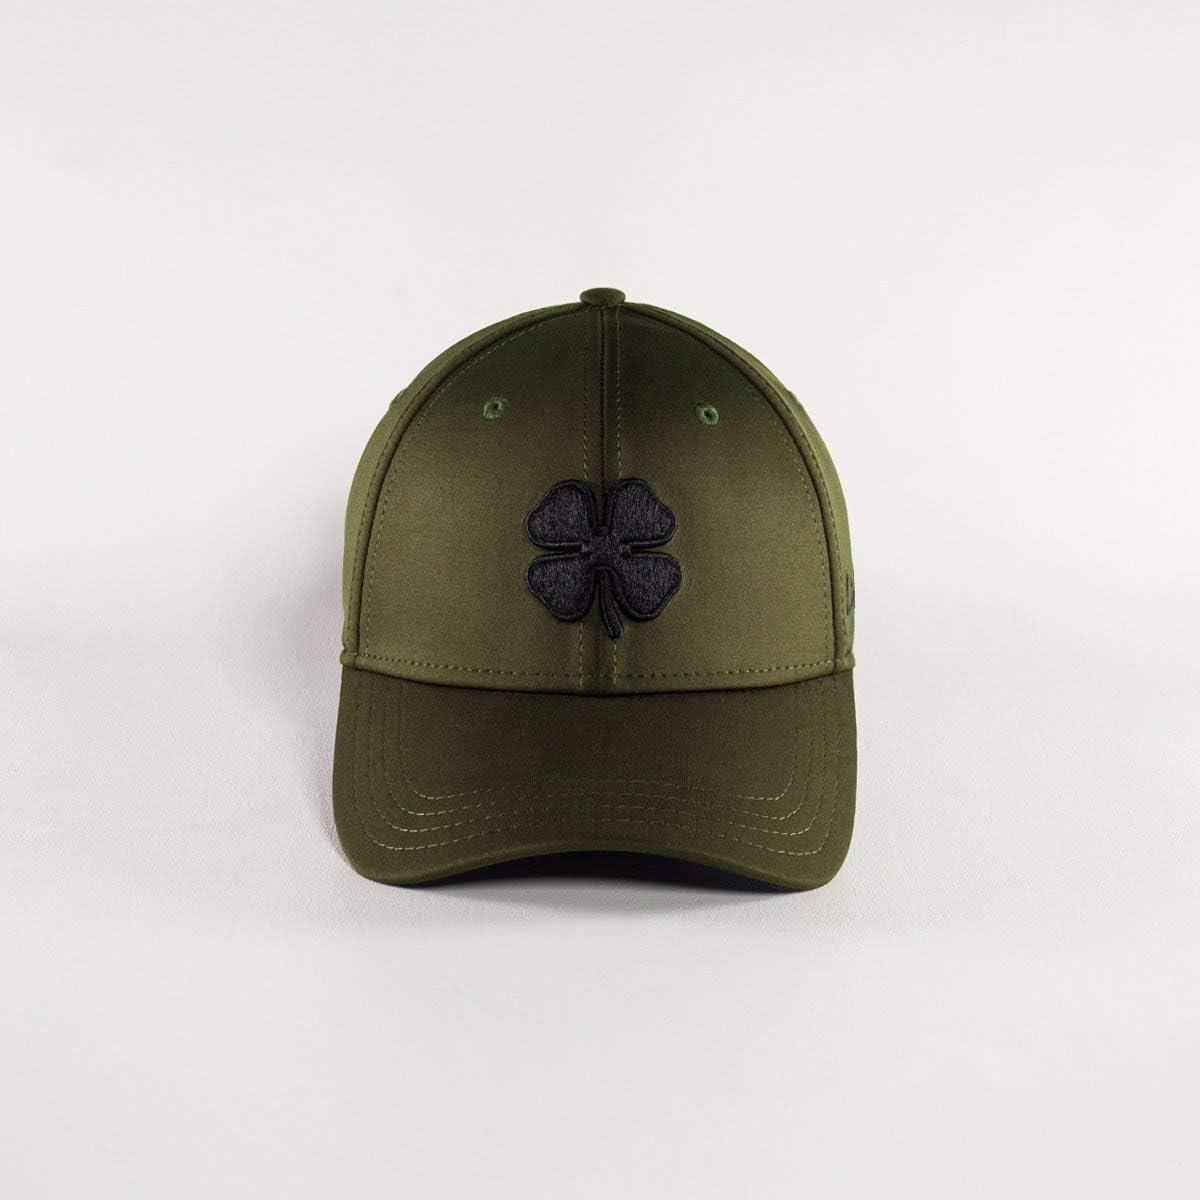 Black Clover Perfect Luck Flex Cap Olive//Black